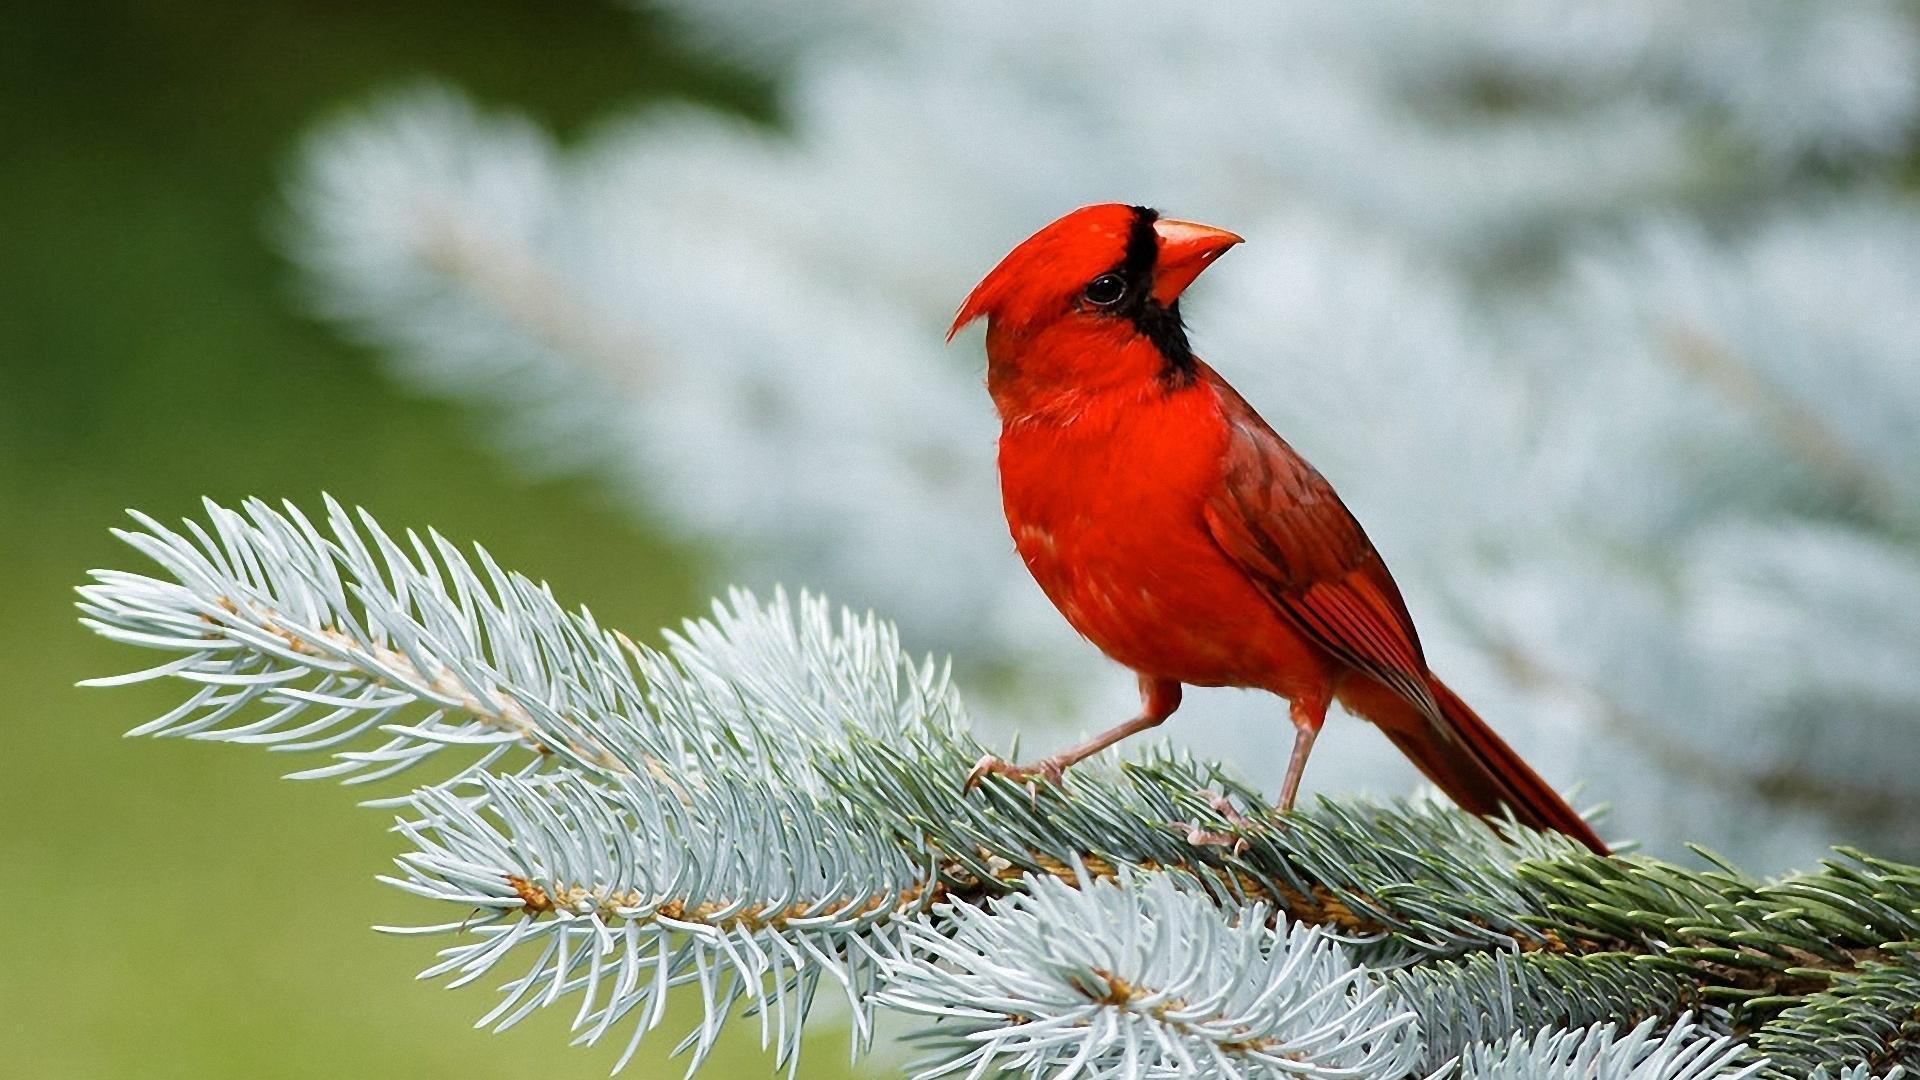 Beautiful Birds Wallpapers Top Free Beautiful Birds Backgrounds Wallpaperaccess